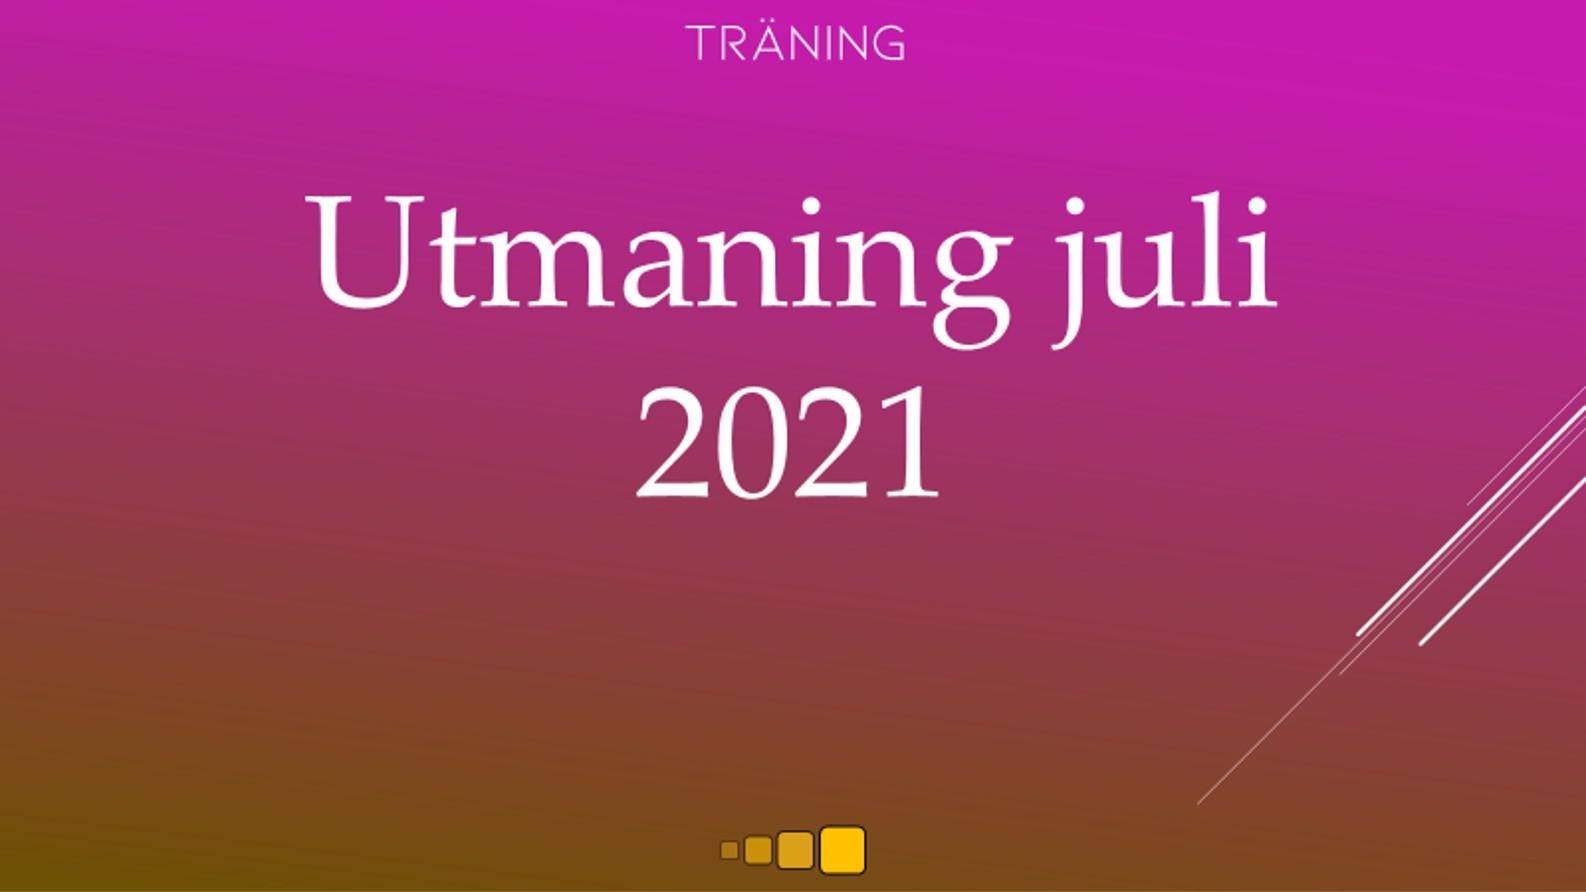 utmaning juli 2021